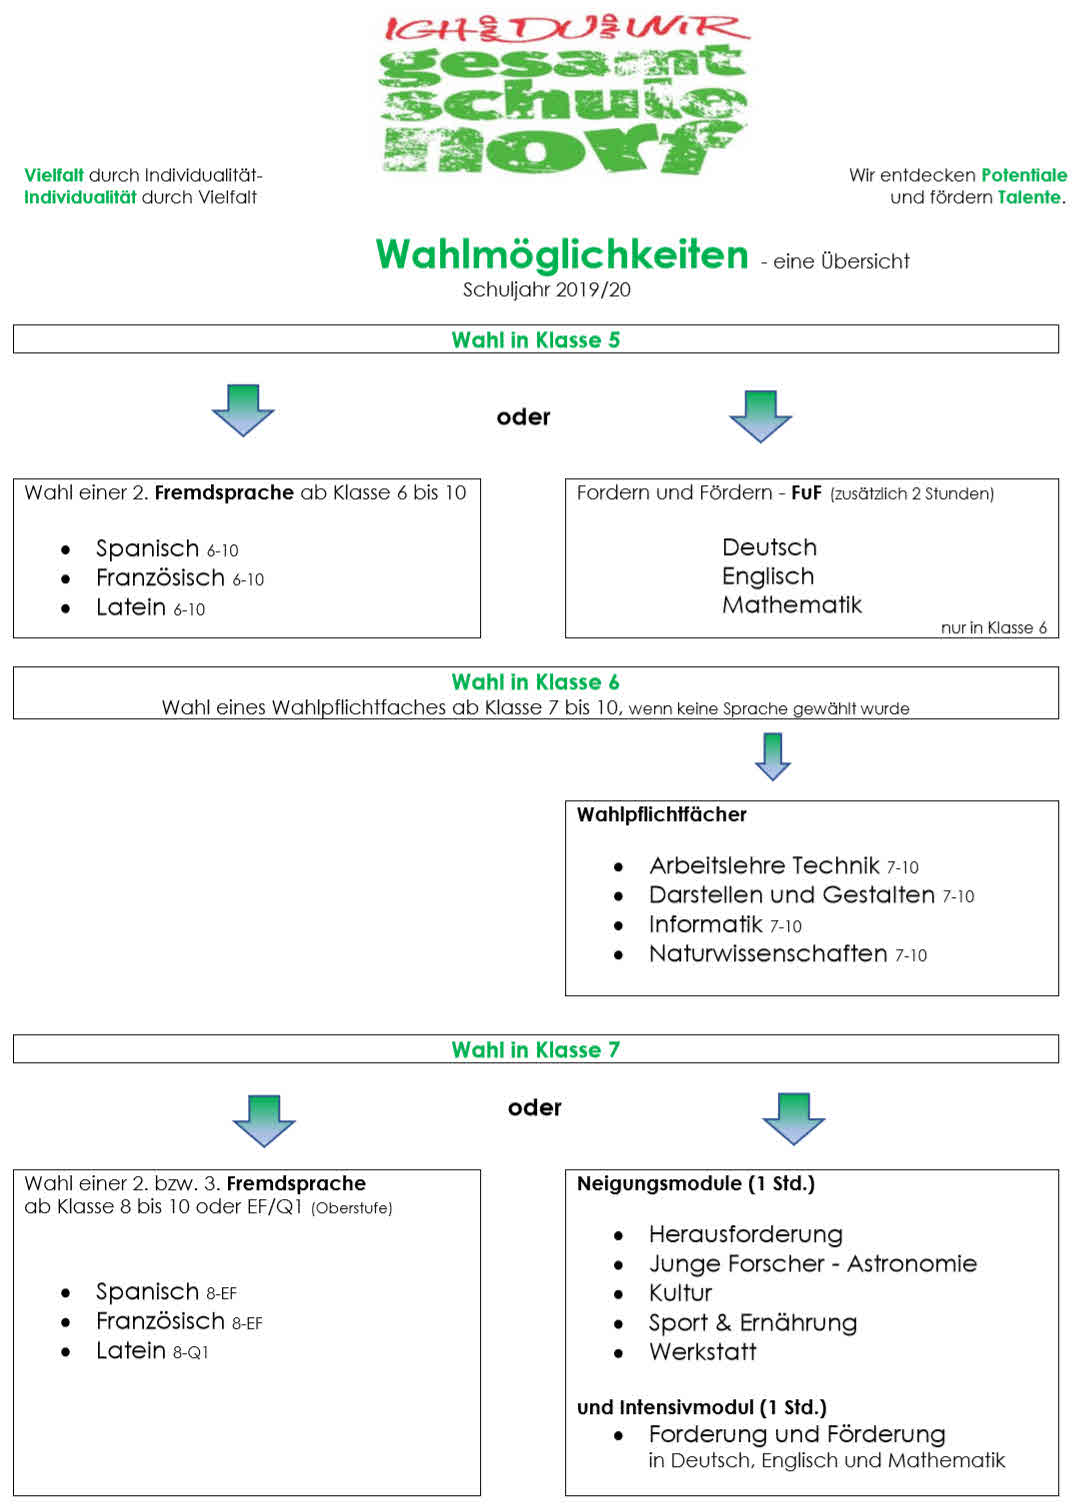 WP-Anwahl_19_20